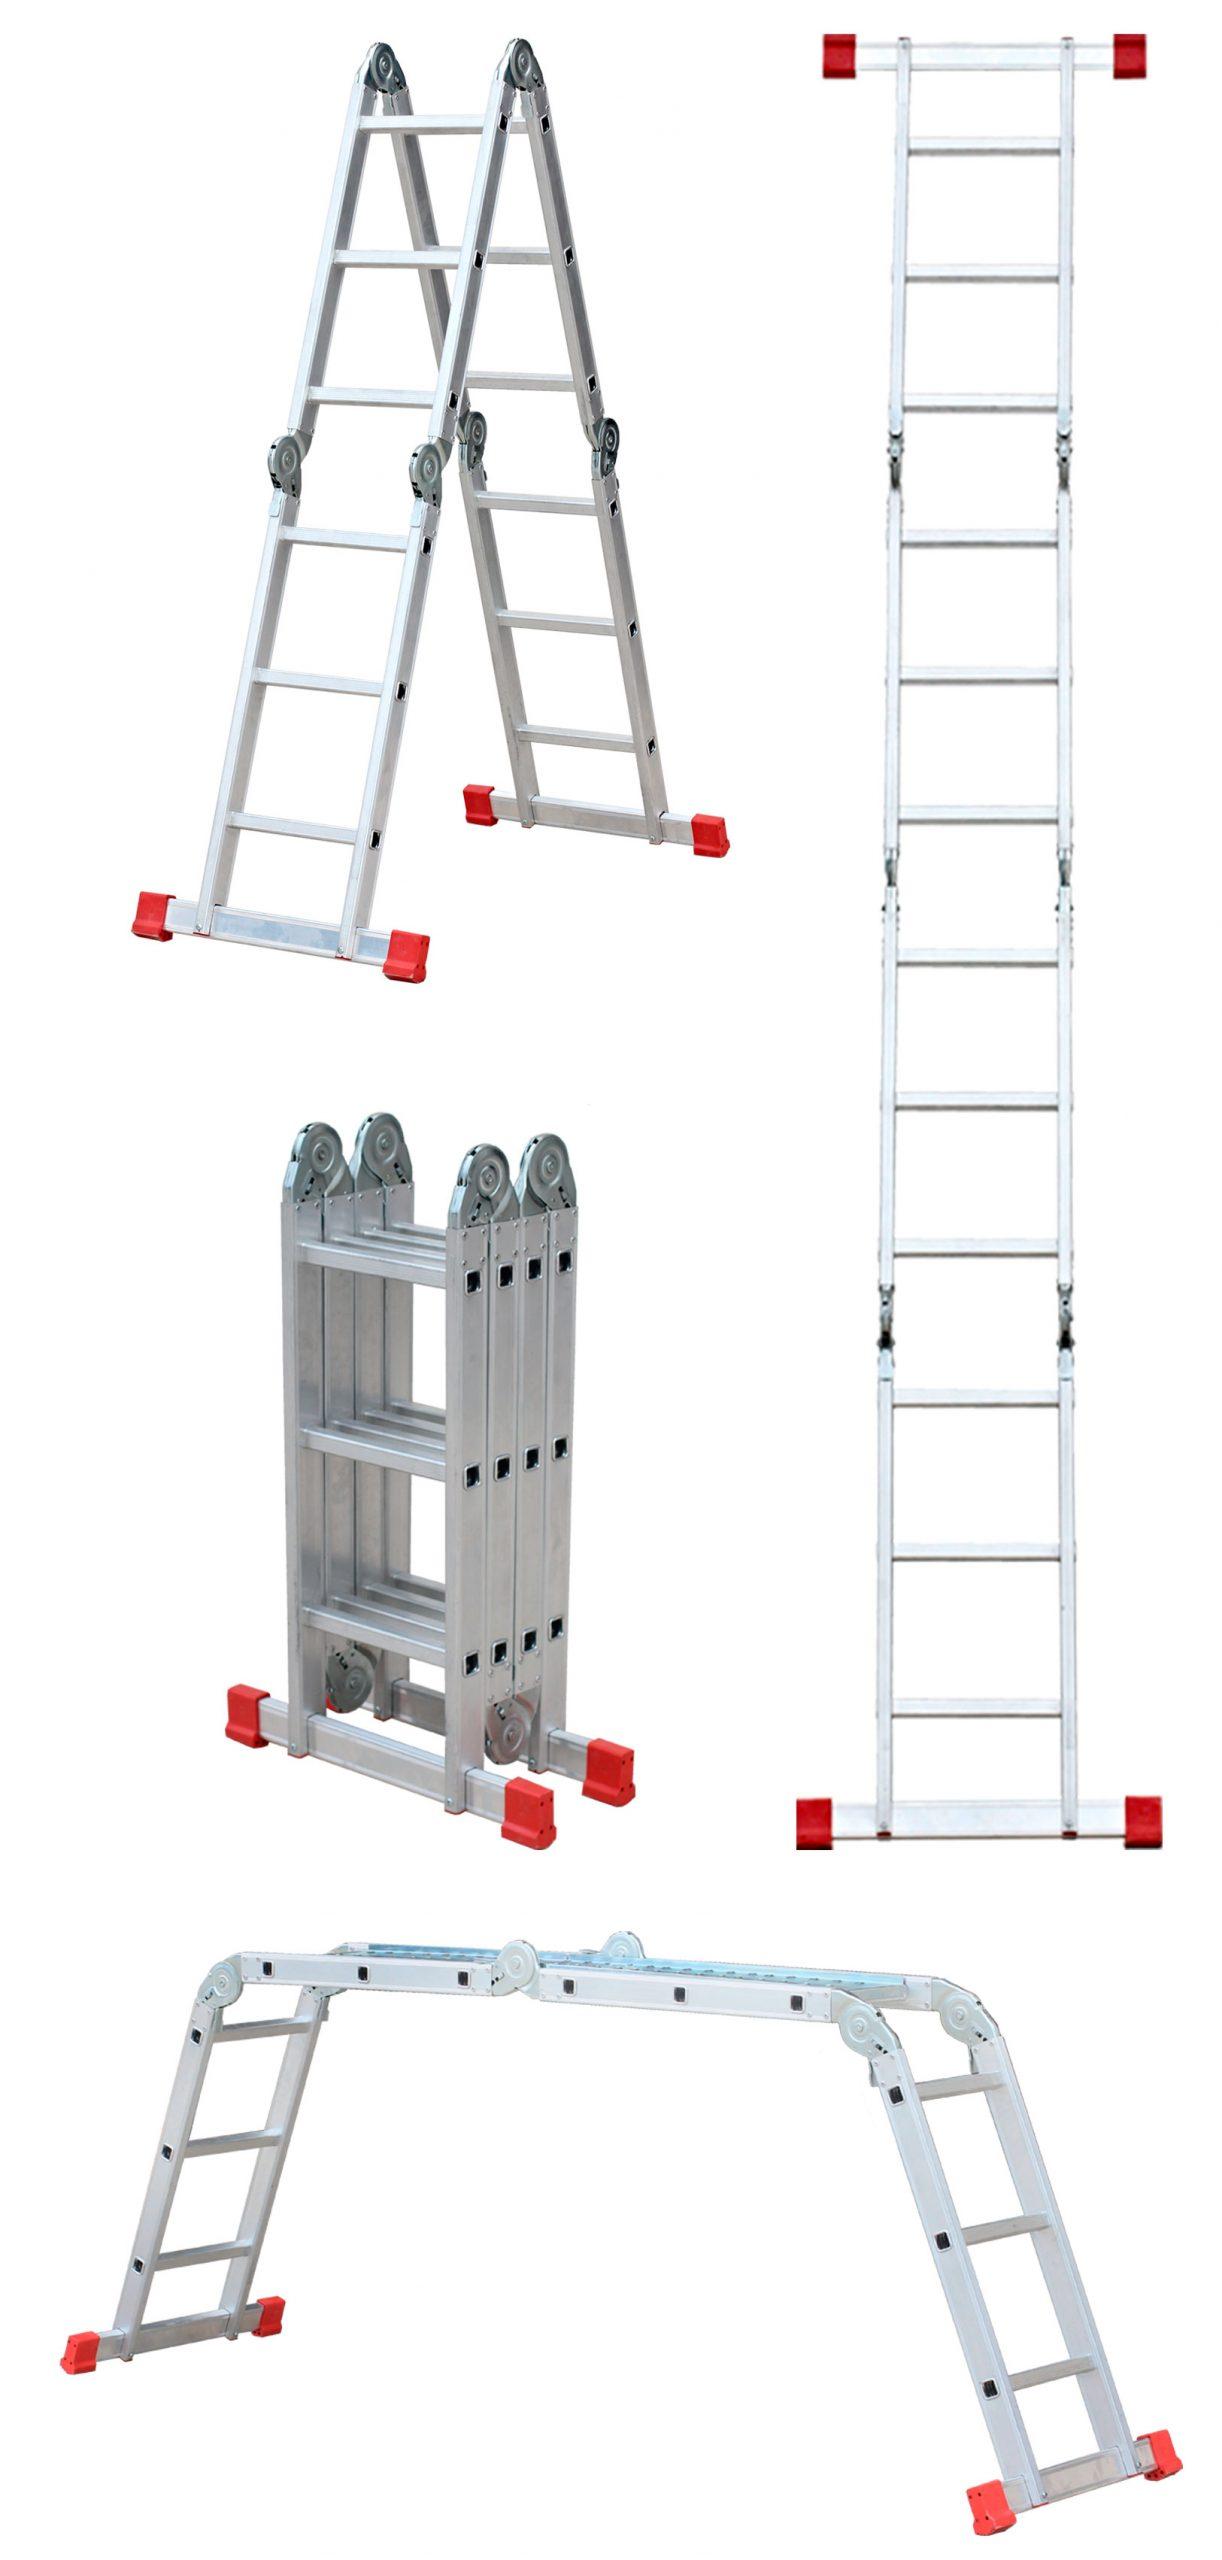 Escalera De Aluminio Multiposición